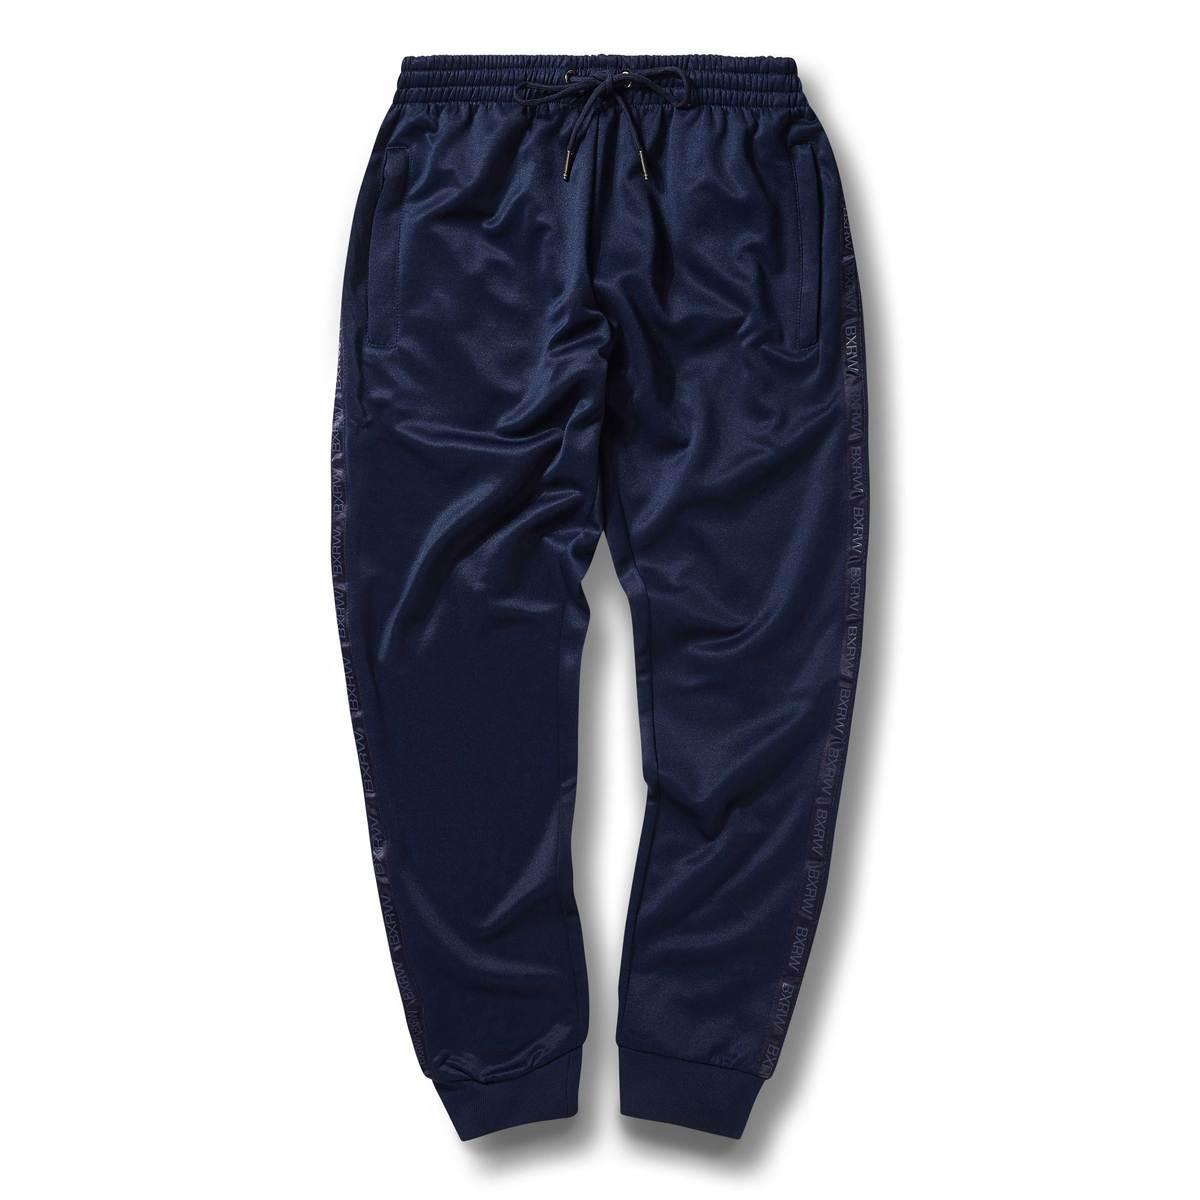 BOXRAW WHITAKER Hose Navy Blau